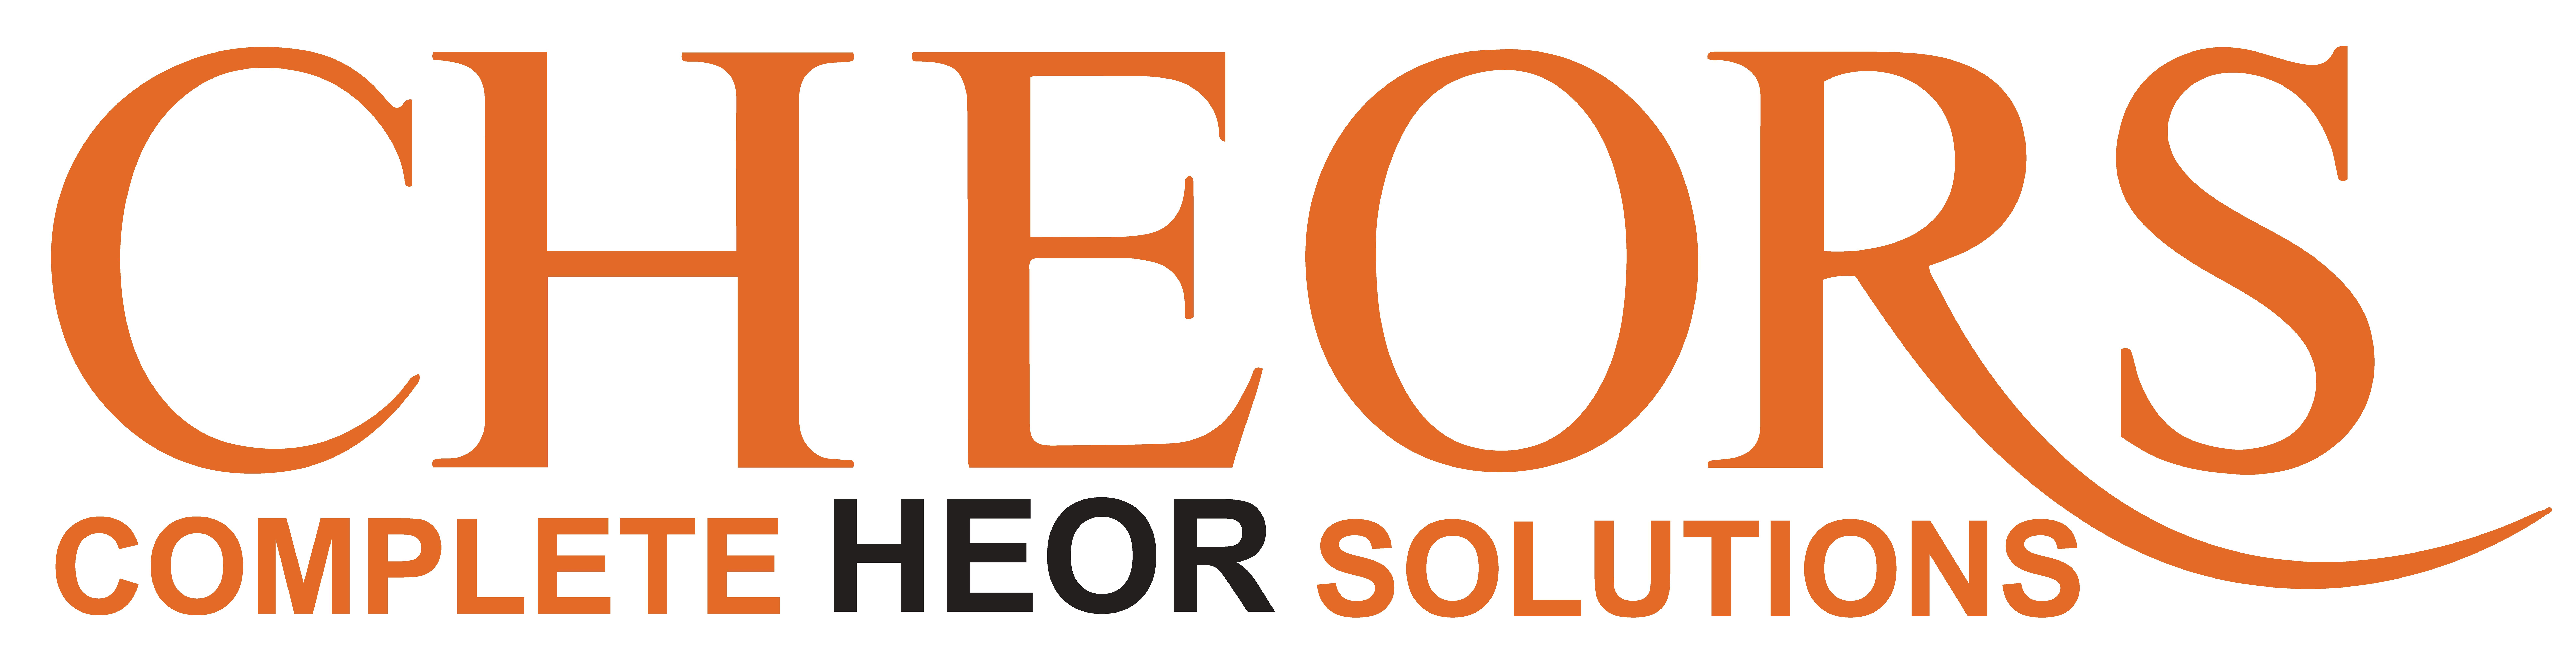 Cheors-Logo-Vector